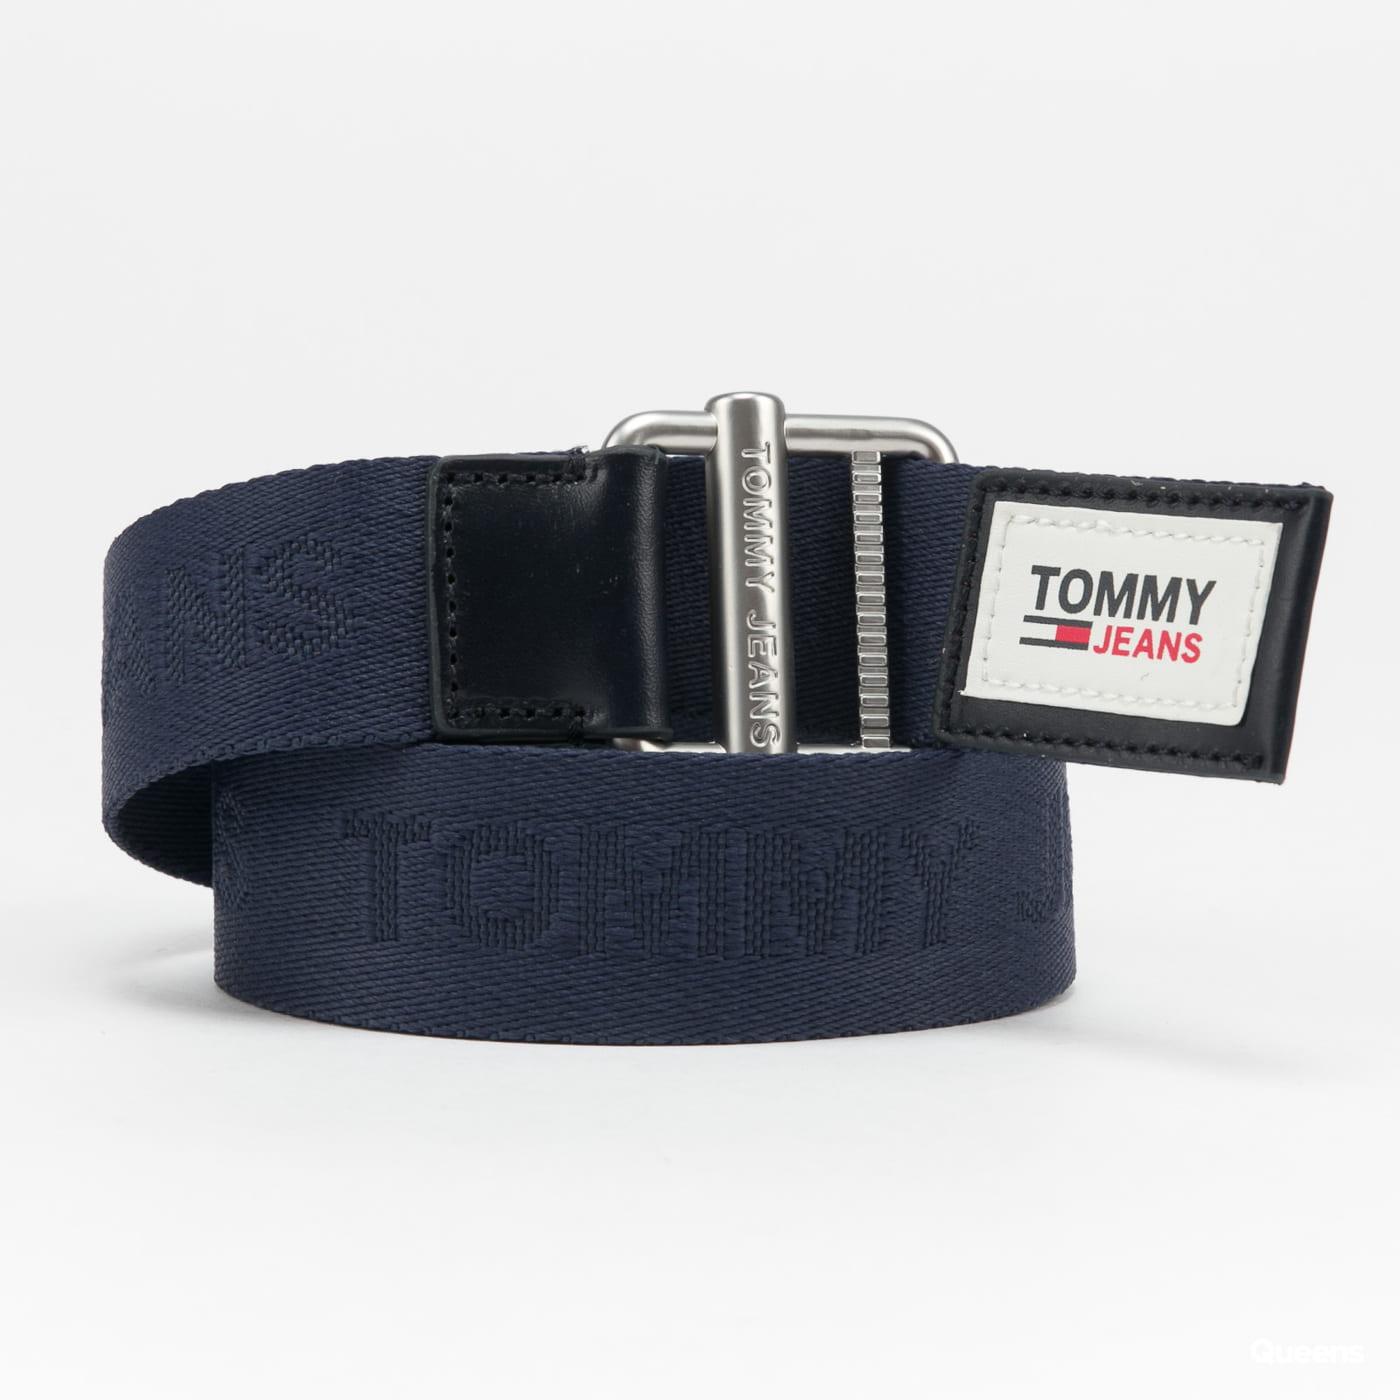 TOMMY JEANS M Essential Webbing Belt navy